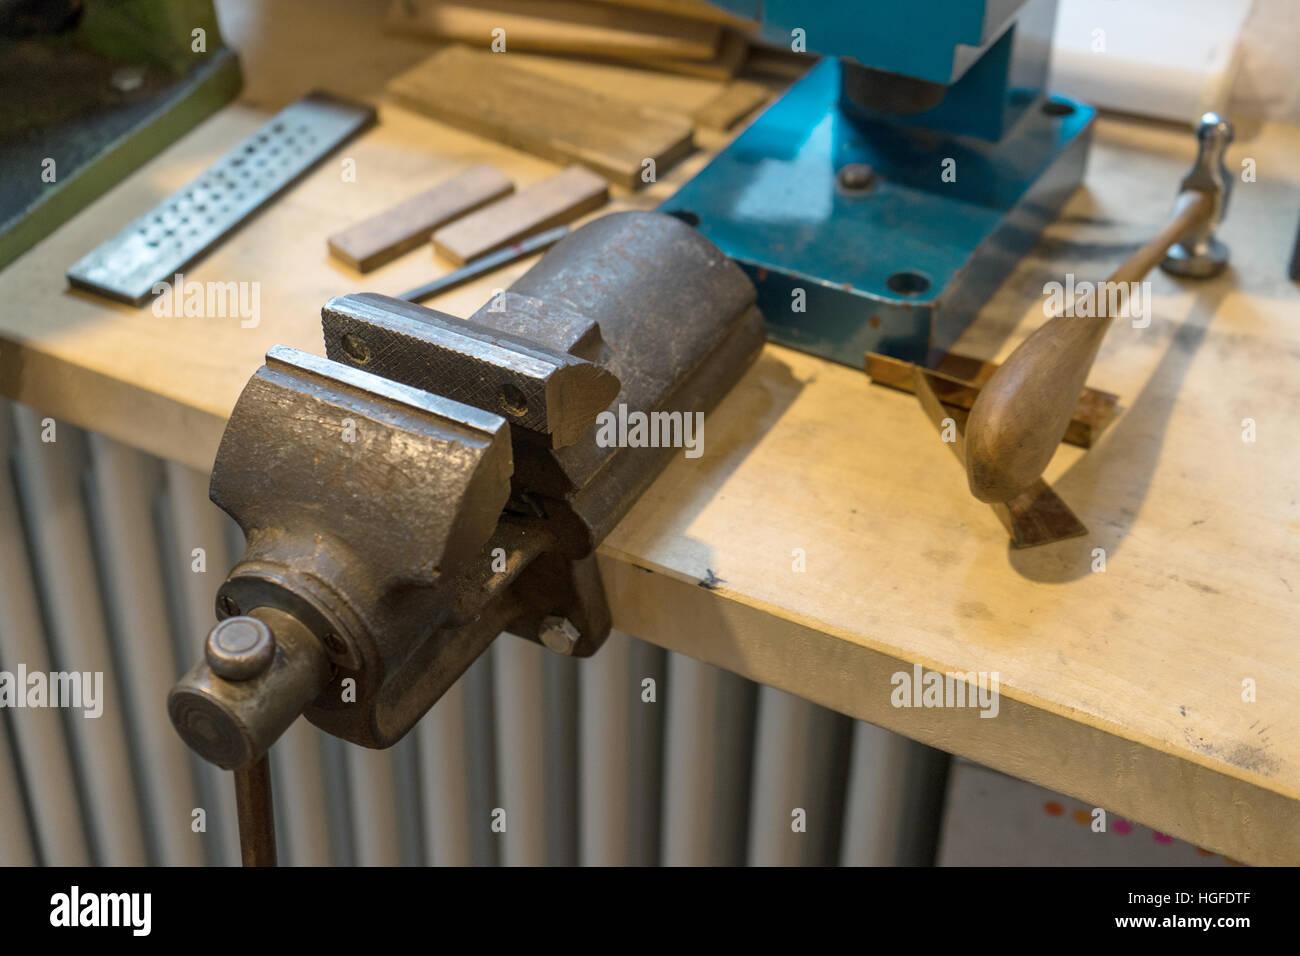 Workbench Vice Stockfotos & Workbench Vice Bilder - Seite 2 - Alamy